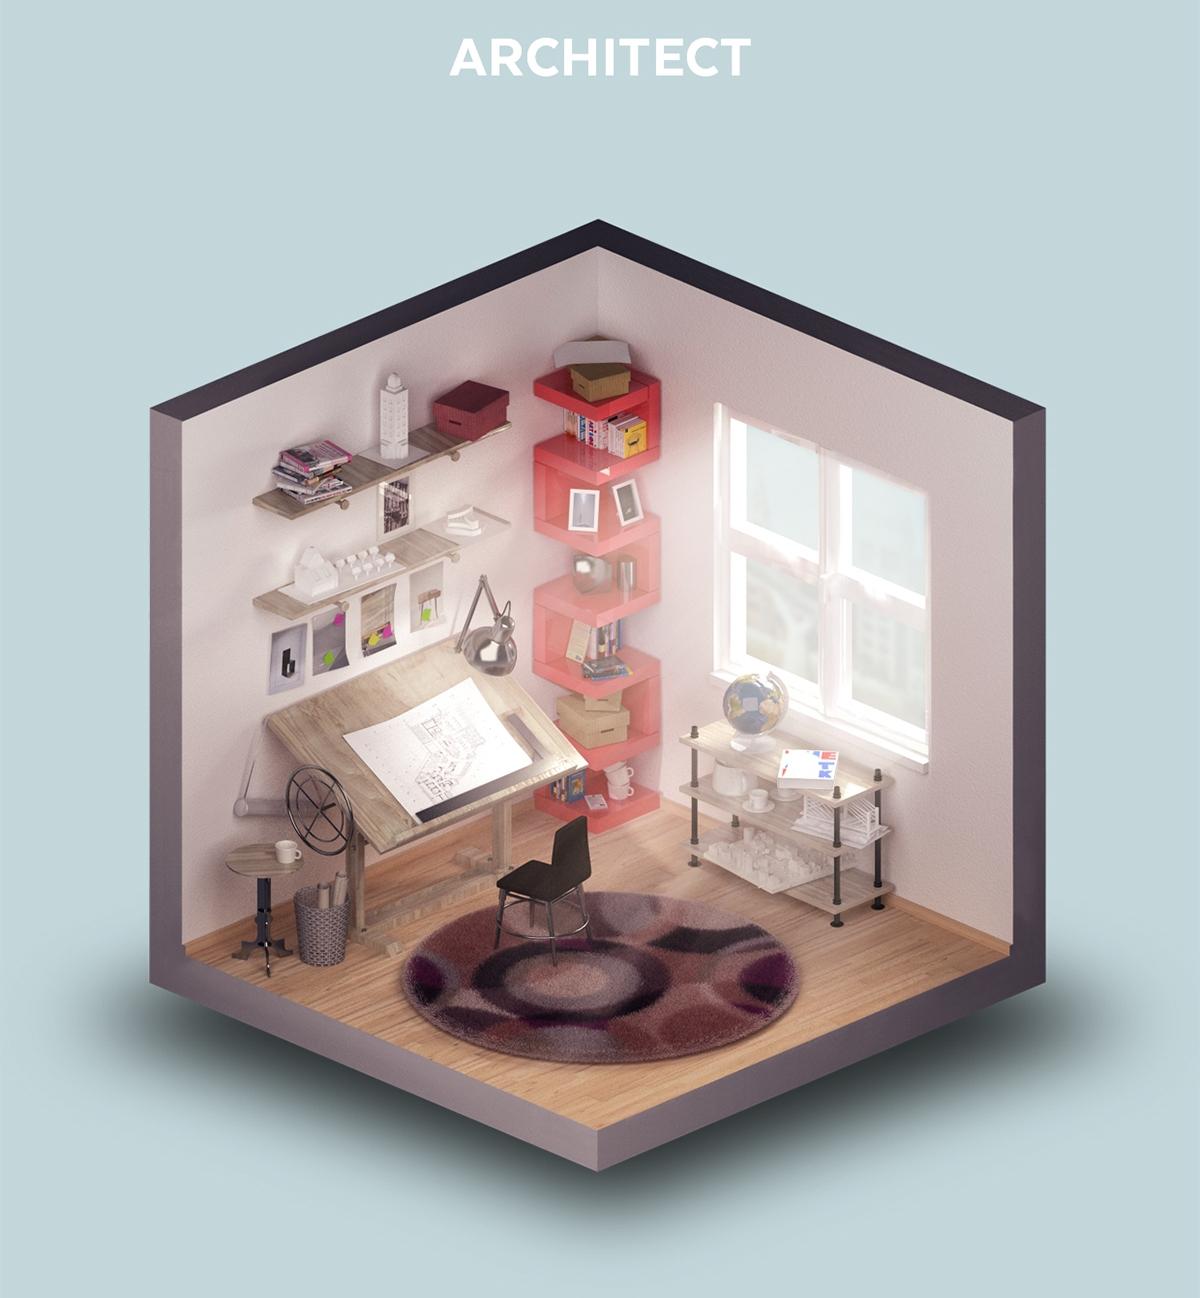 01-Room-of-an-Architect-Petr-Kollarcik-Digital-Interiors-Design-and-Modern-Nomads-illustrations-www-designstack-co